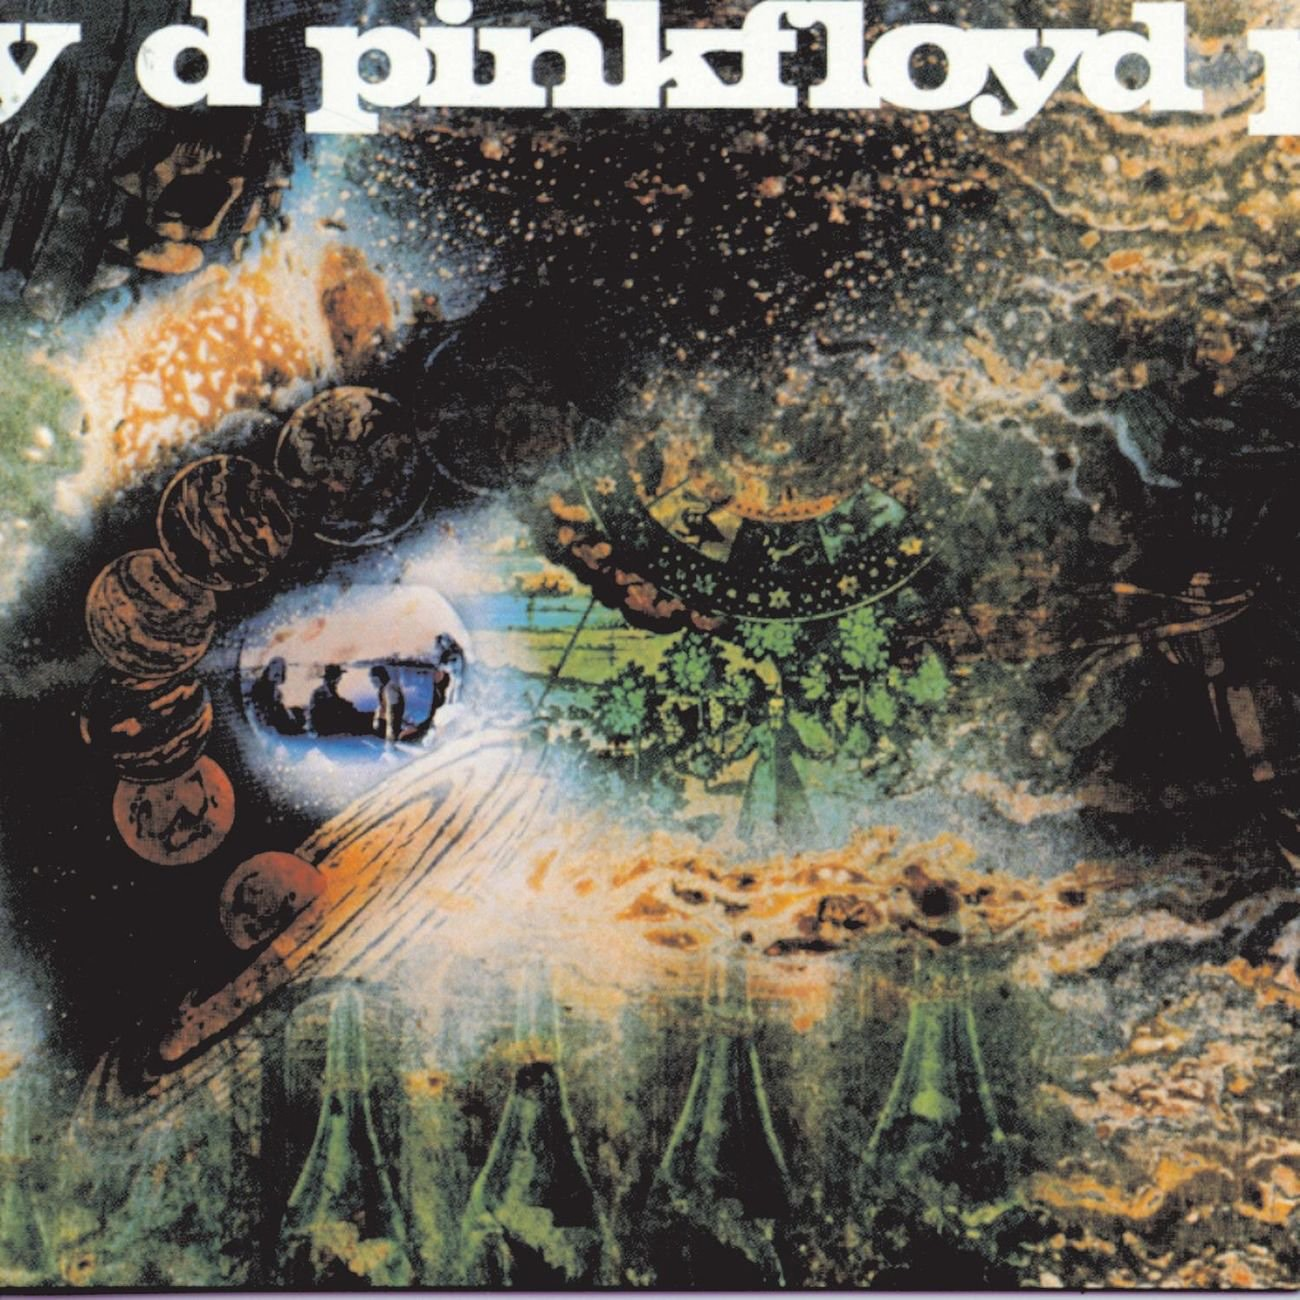 A-Saucerful-of-Secrets-Pink-Floyd--1626128631